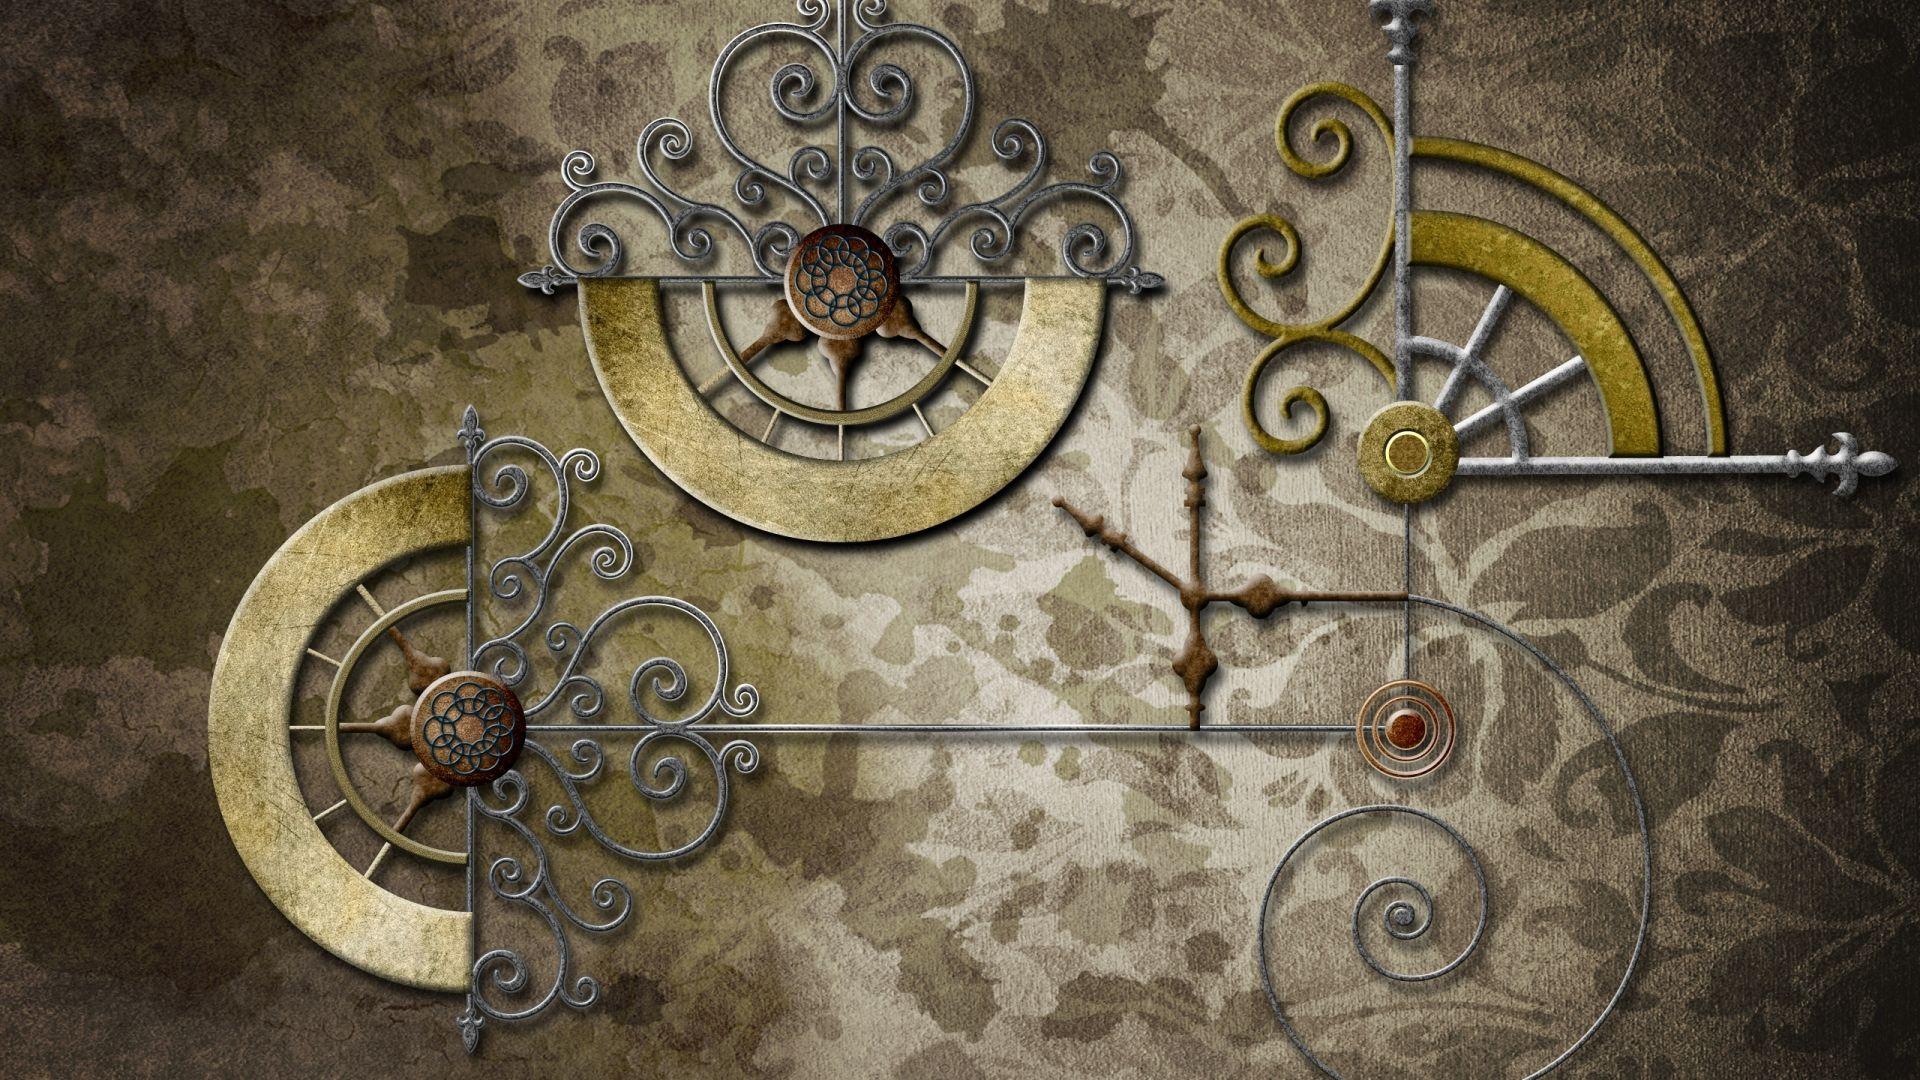 Free Steampunk Wallpaper Widescreen For Desktop